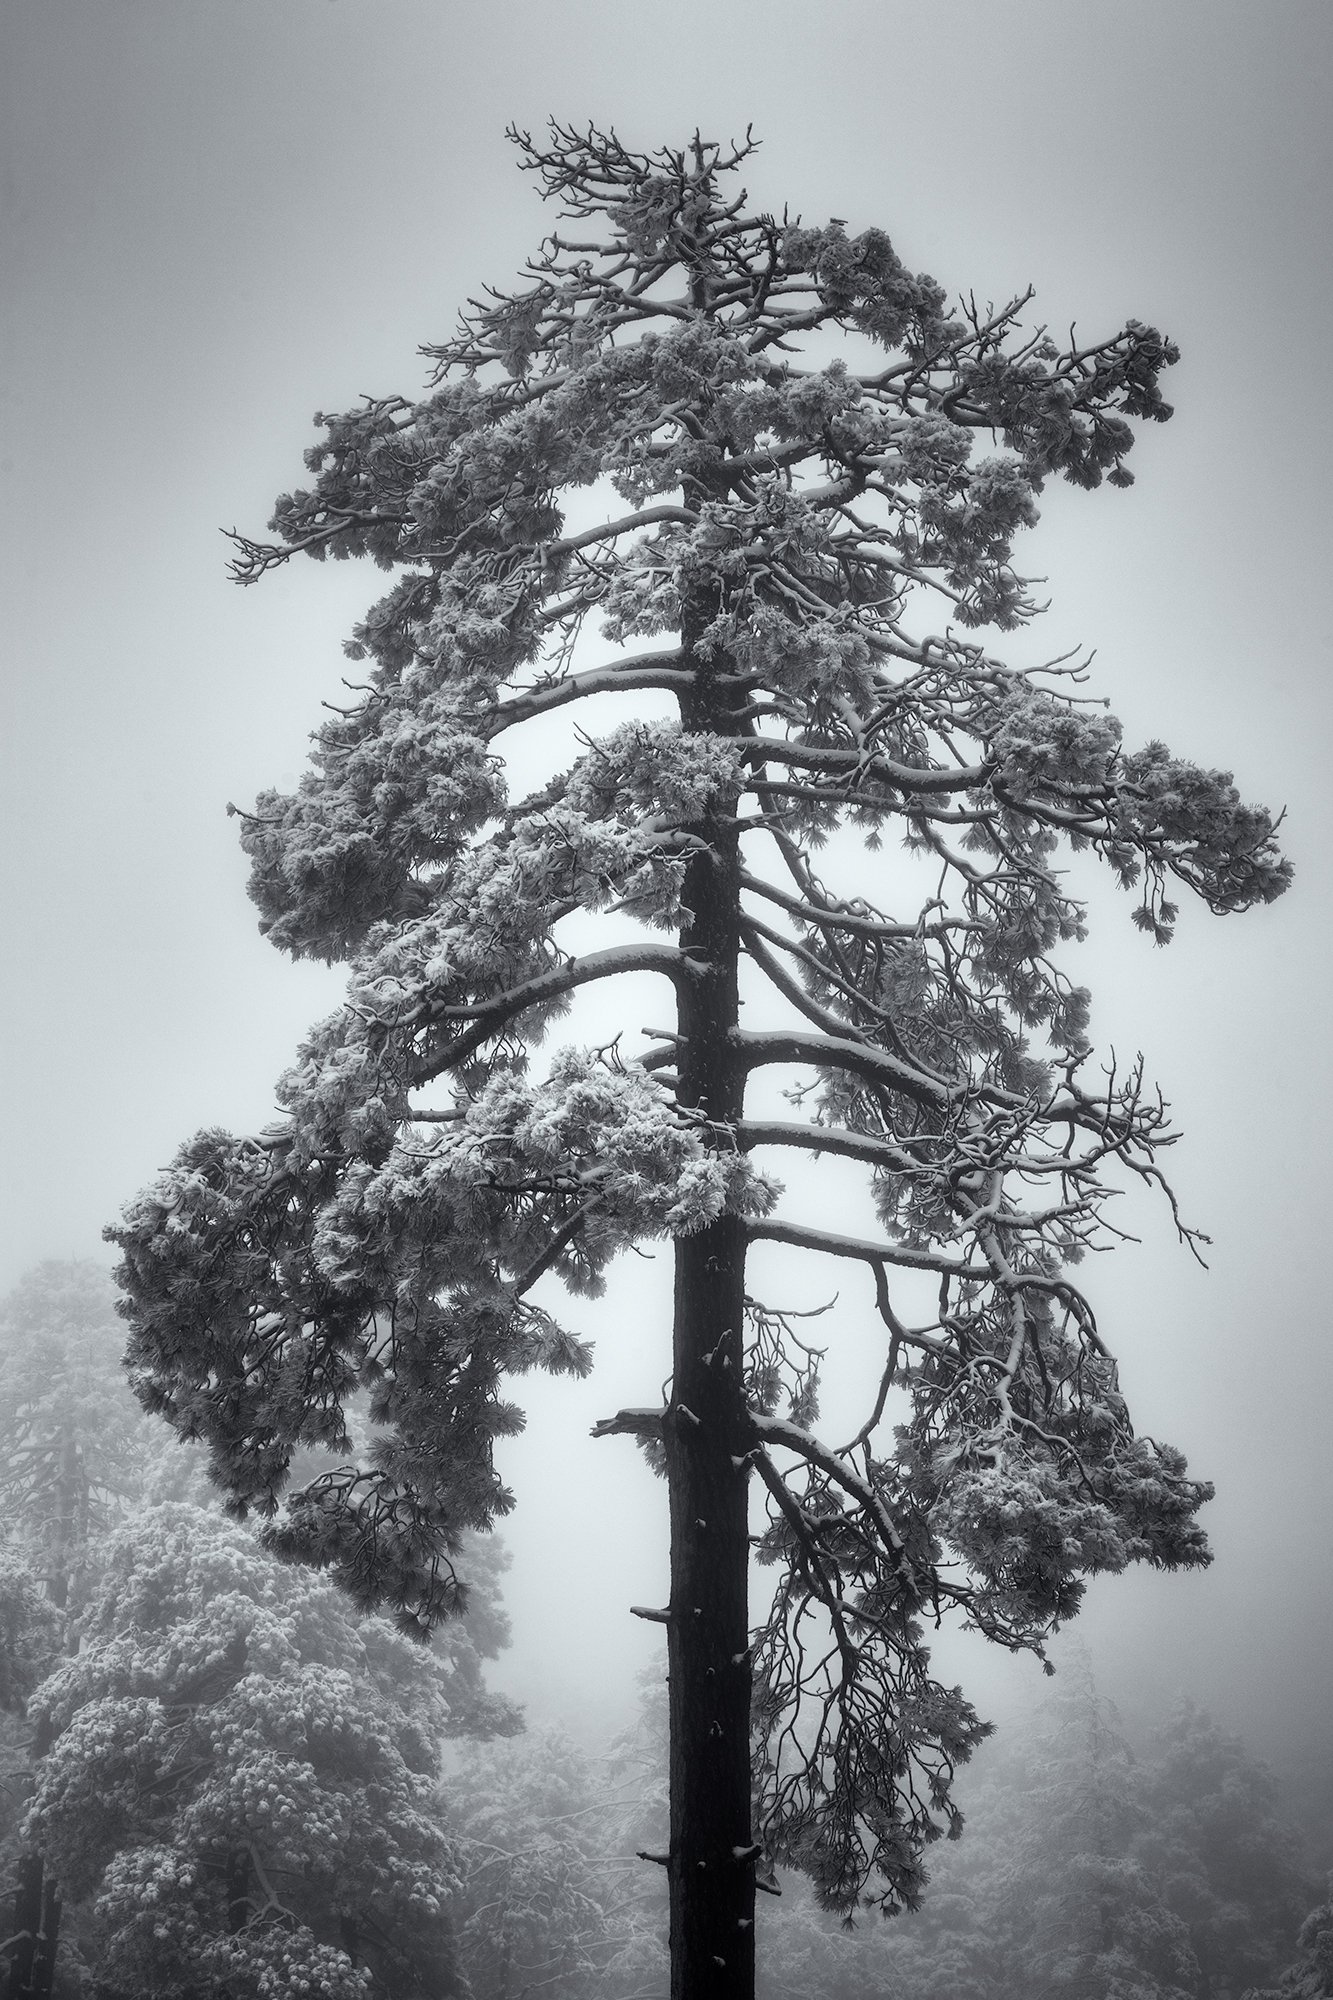 Tree in Fog and Snow. Mt. Lemon, Arizona, 2016